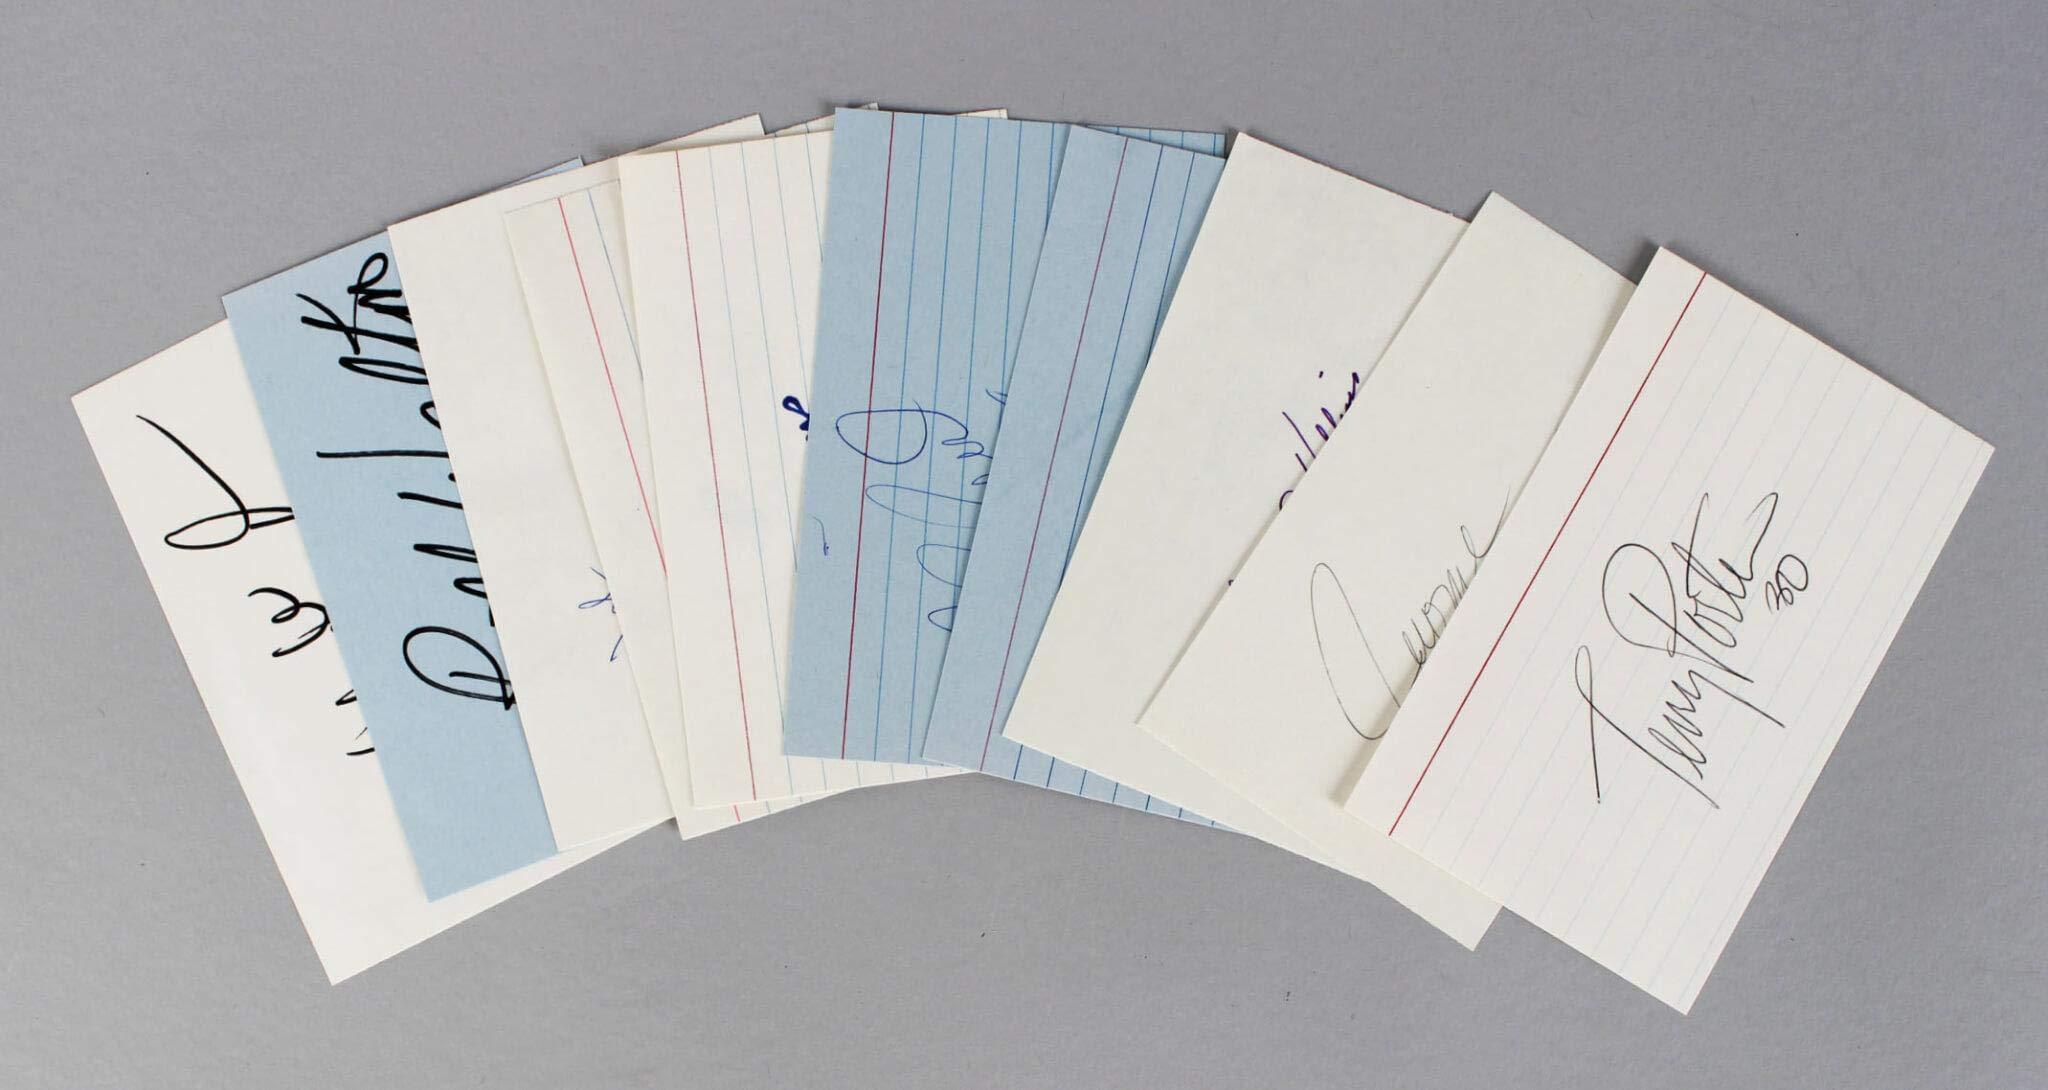 Trailblazers Signed Index Card Lot (10) Bill Walton, Clyde Drexler, etc. COA JSA Certified NBA Cut Signatures